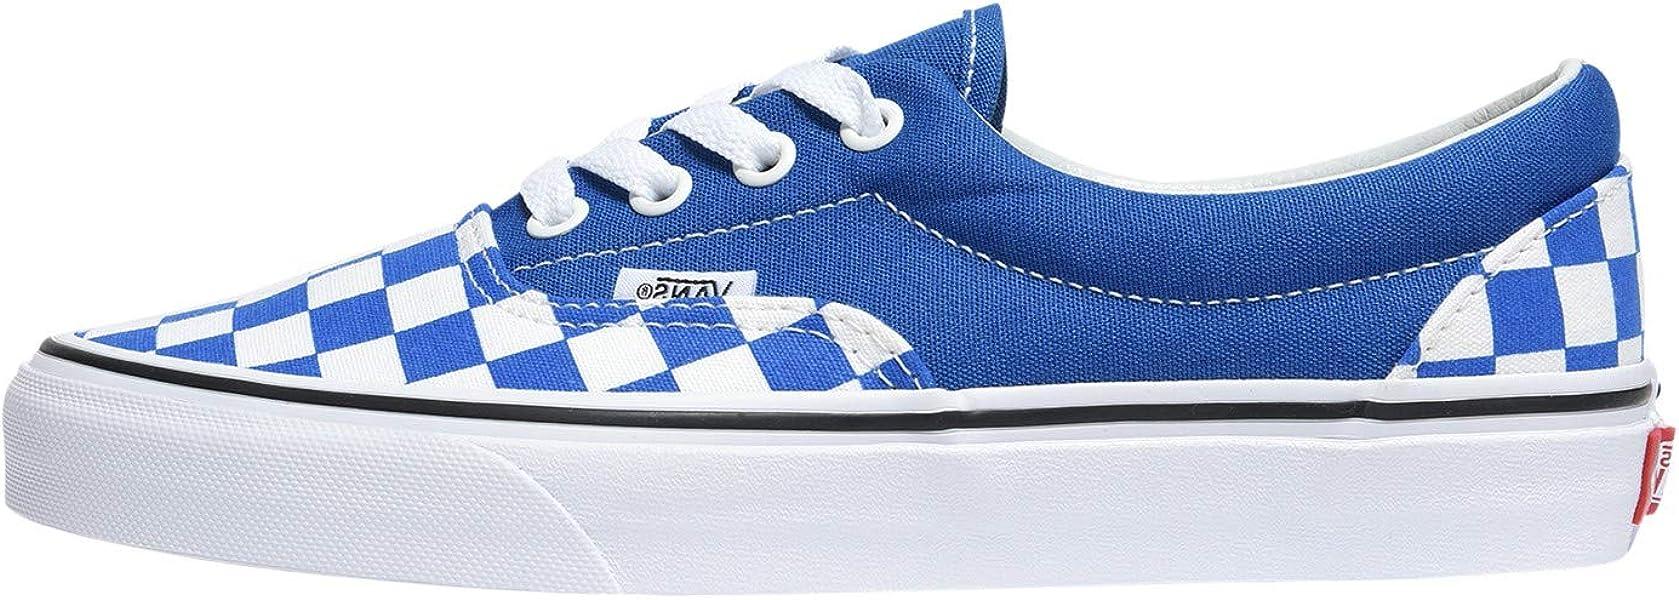 5704bb39c1 Vans (Checkerboard Lapis Blue True White VN0A38FRVOU Mens 7.5 Womens 11